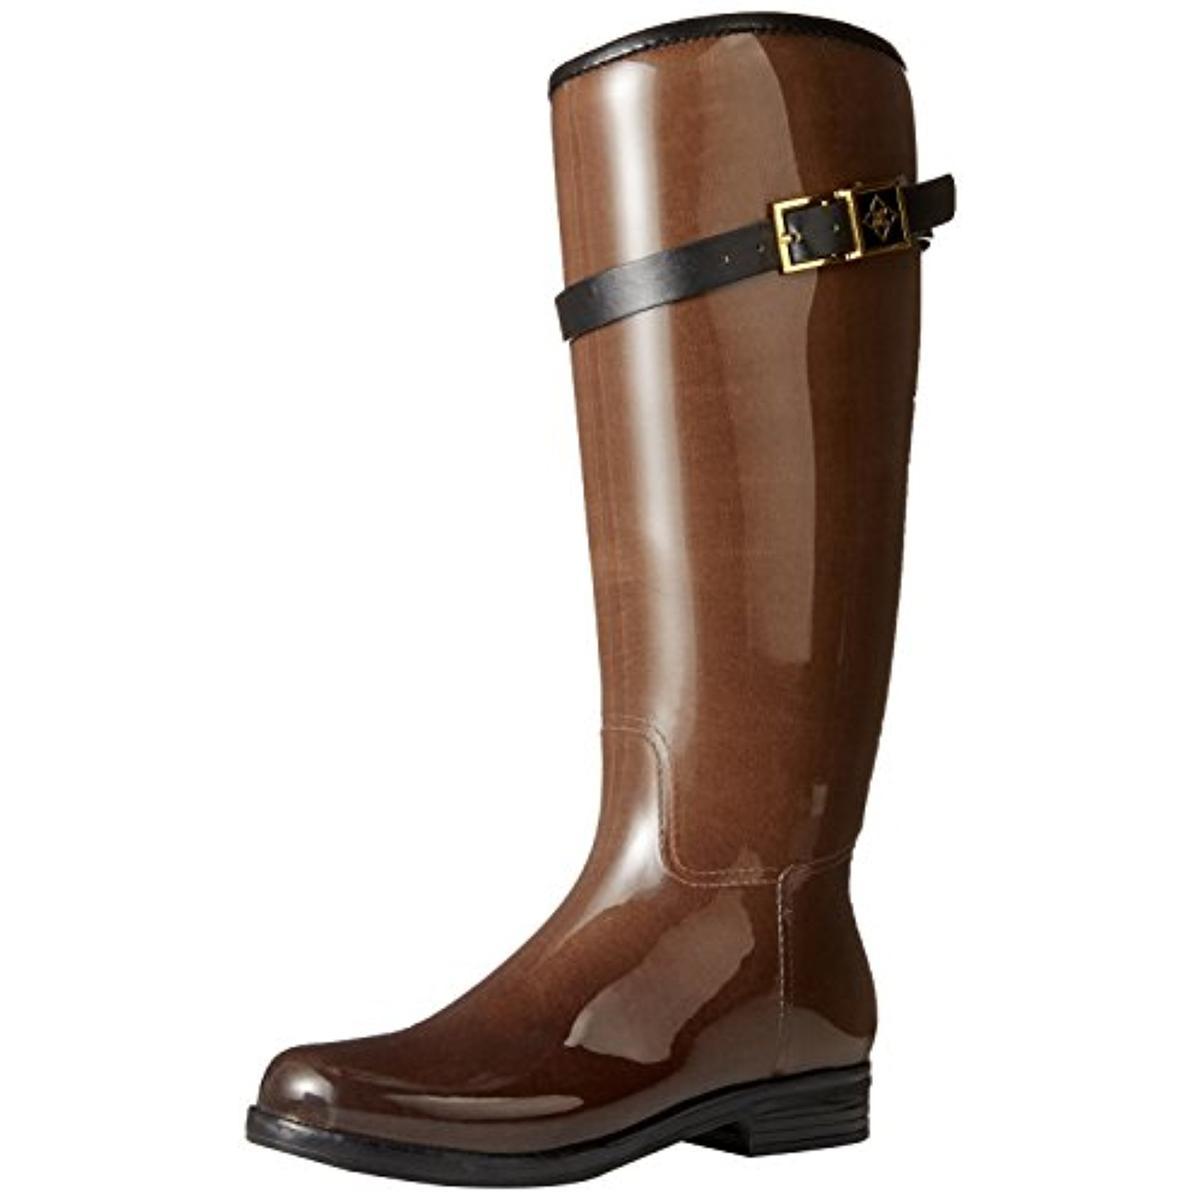 DAV Womens Bristol Patent Knee-High Rain Boots